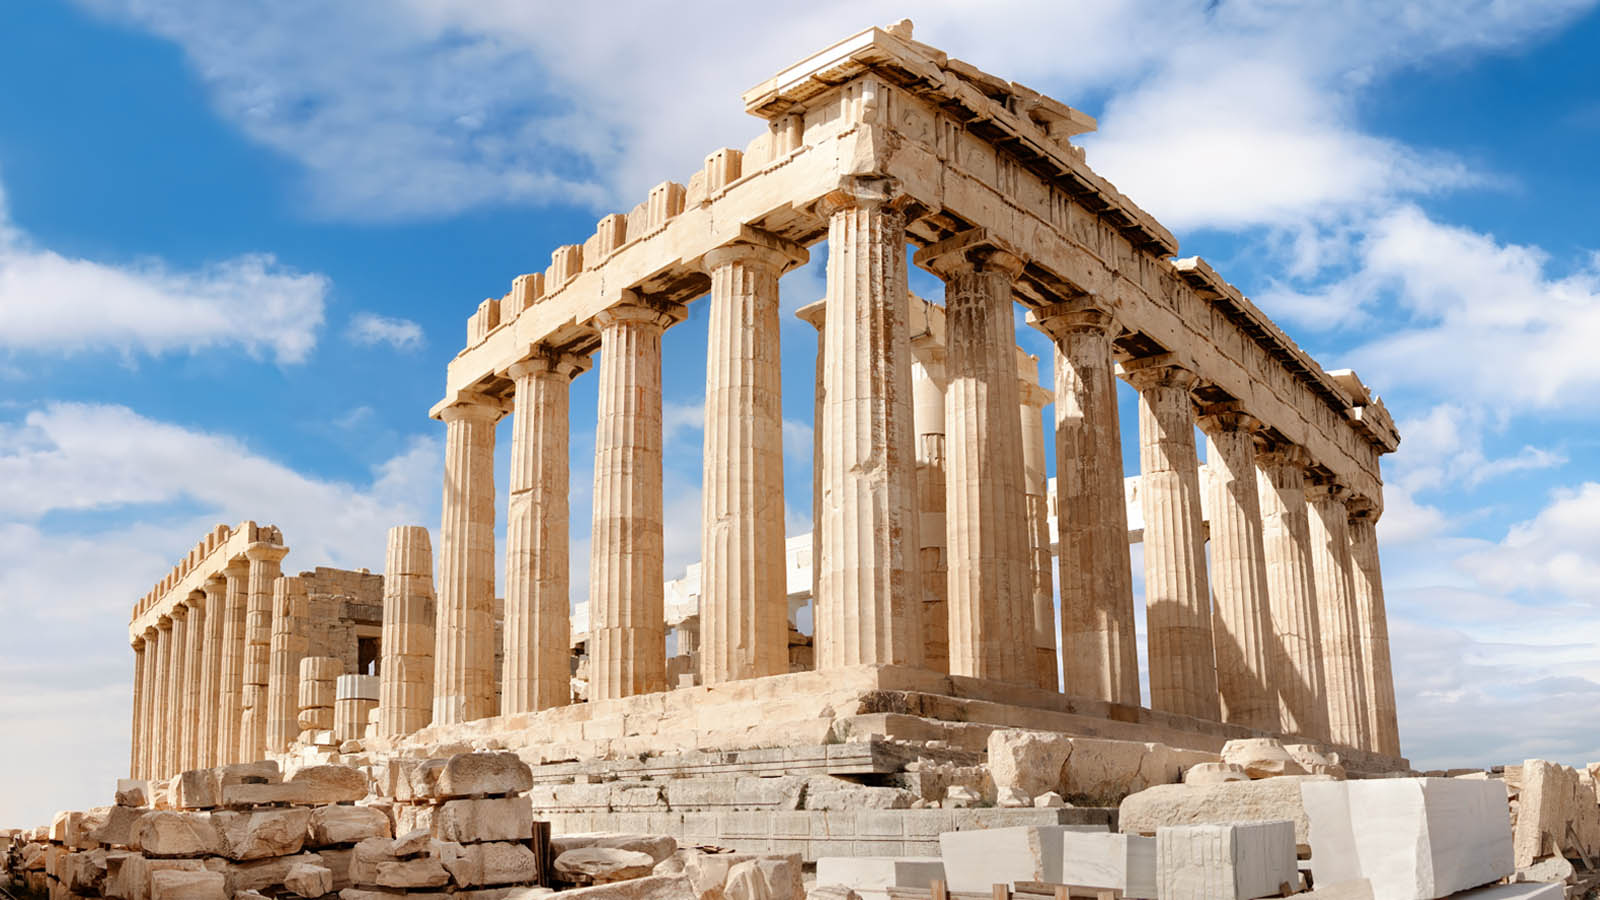 Acropolis of Athens Greece blue sky